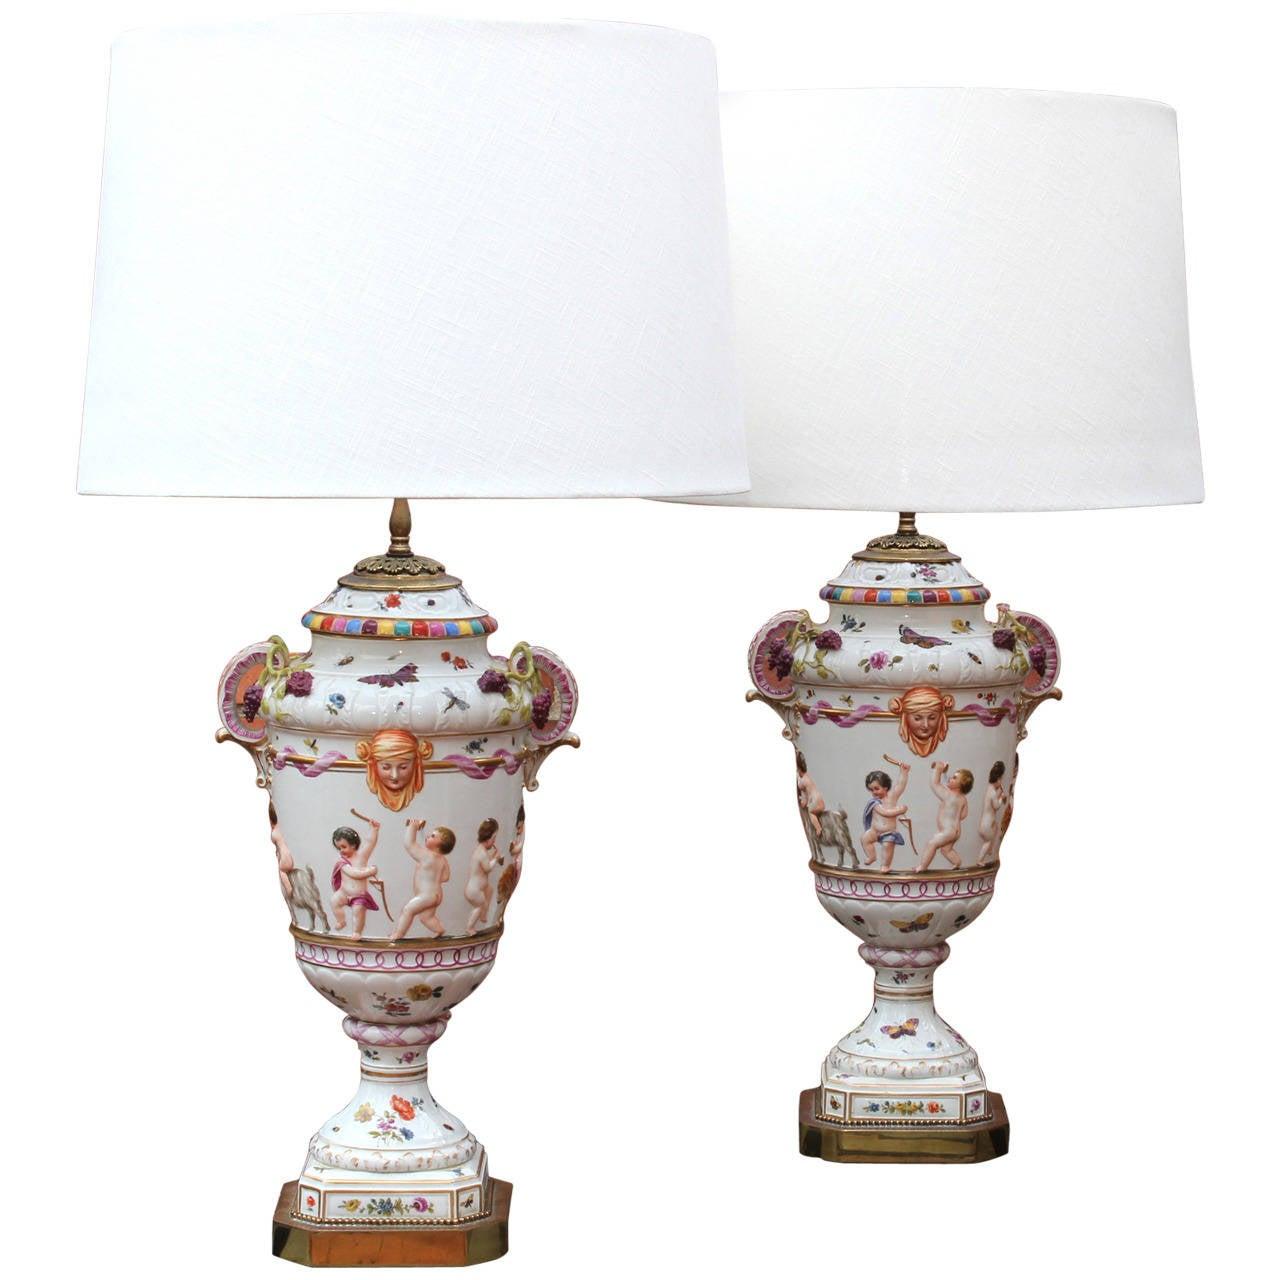 Large Pair of Italian Capo Di Monte Table Lamps